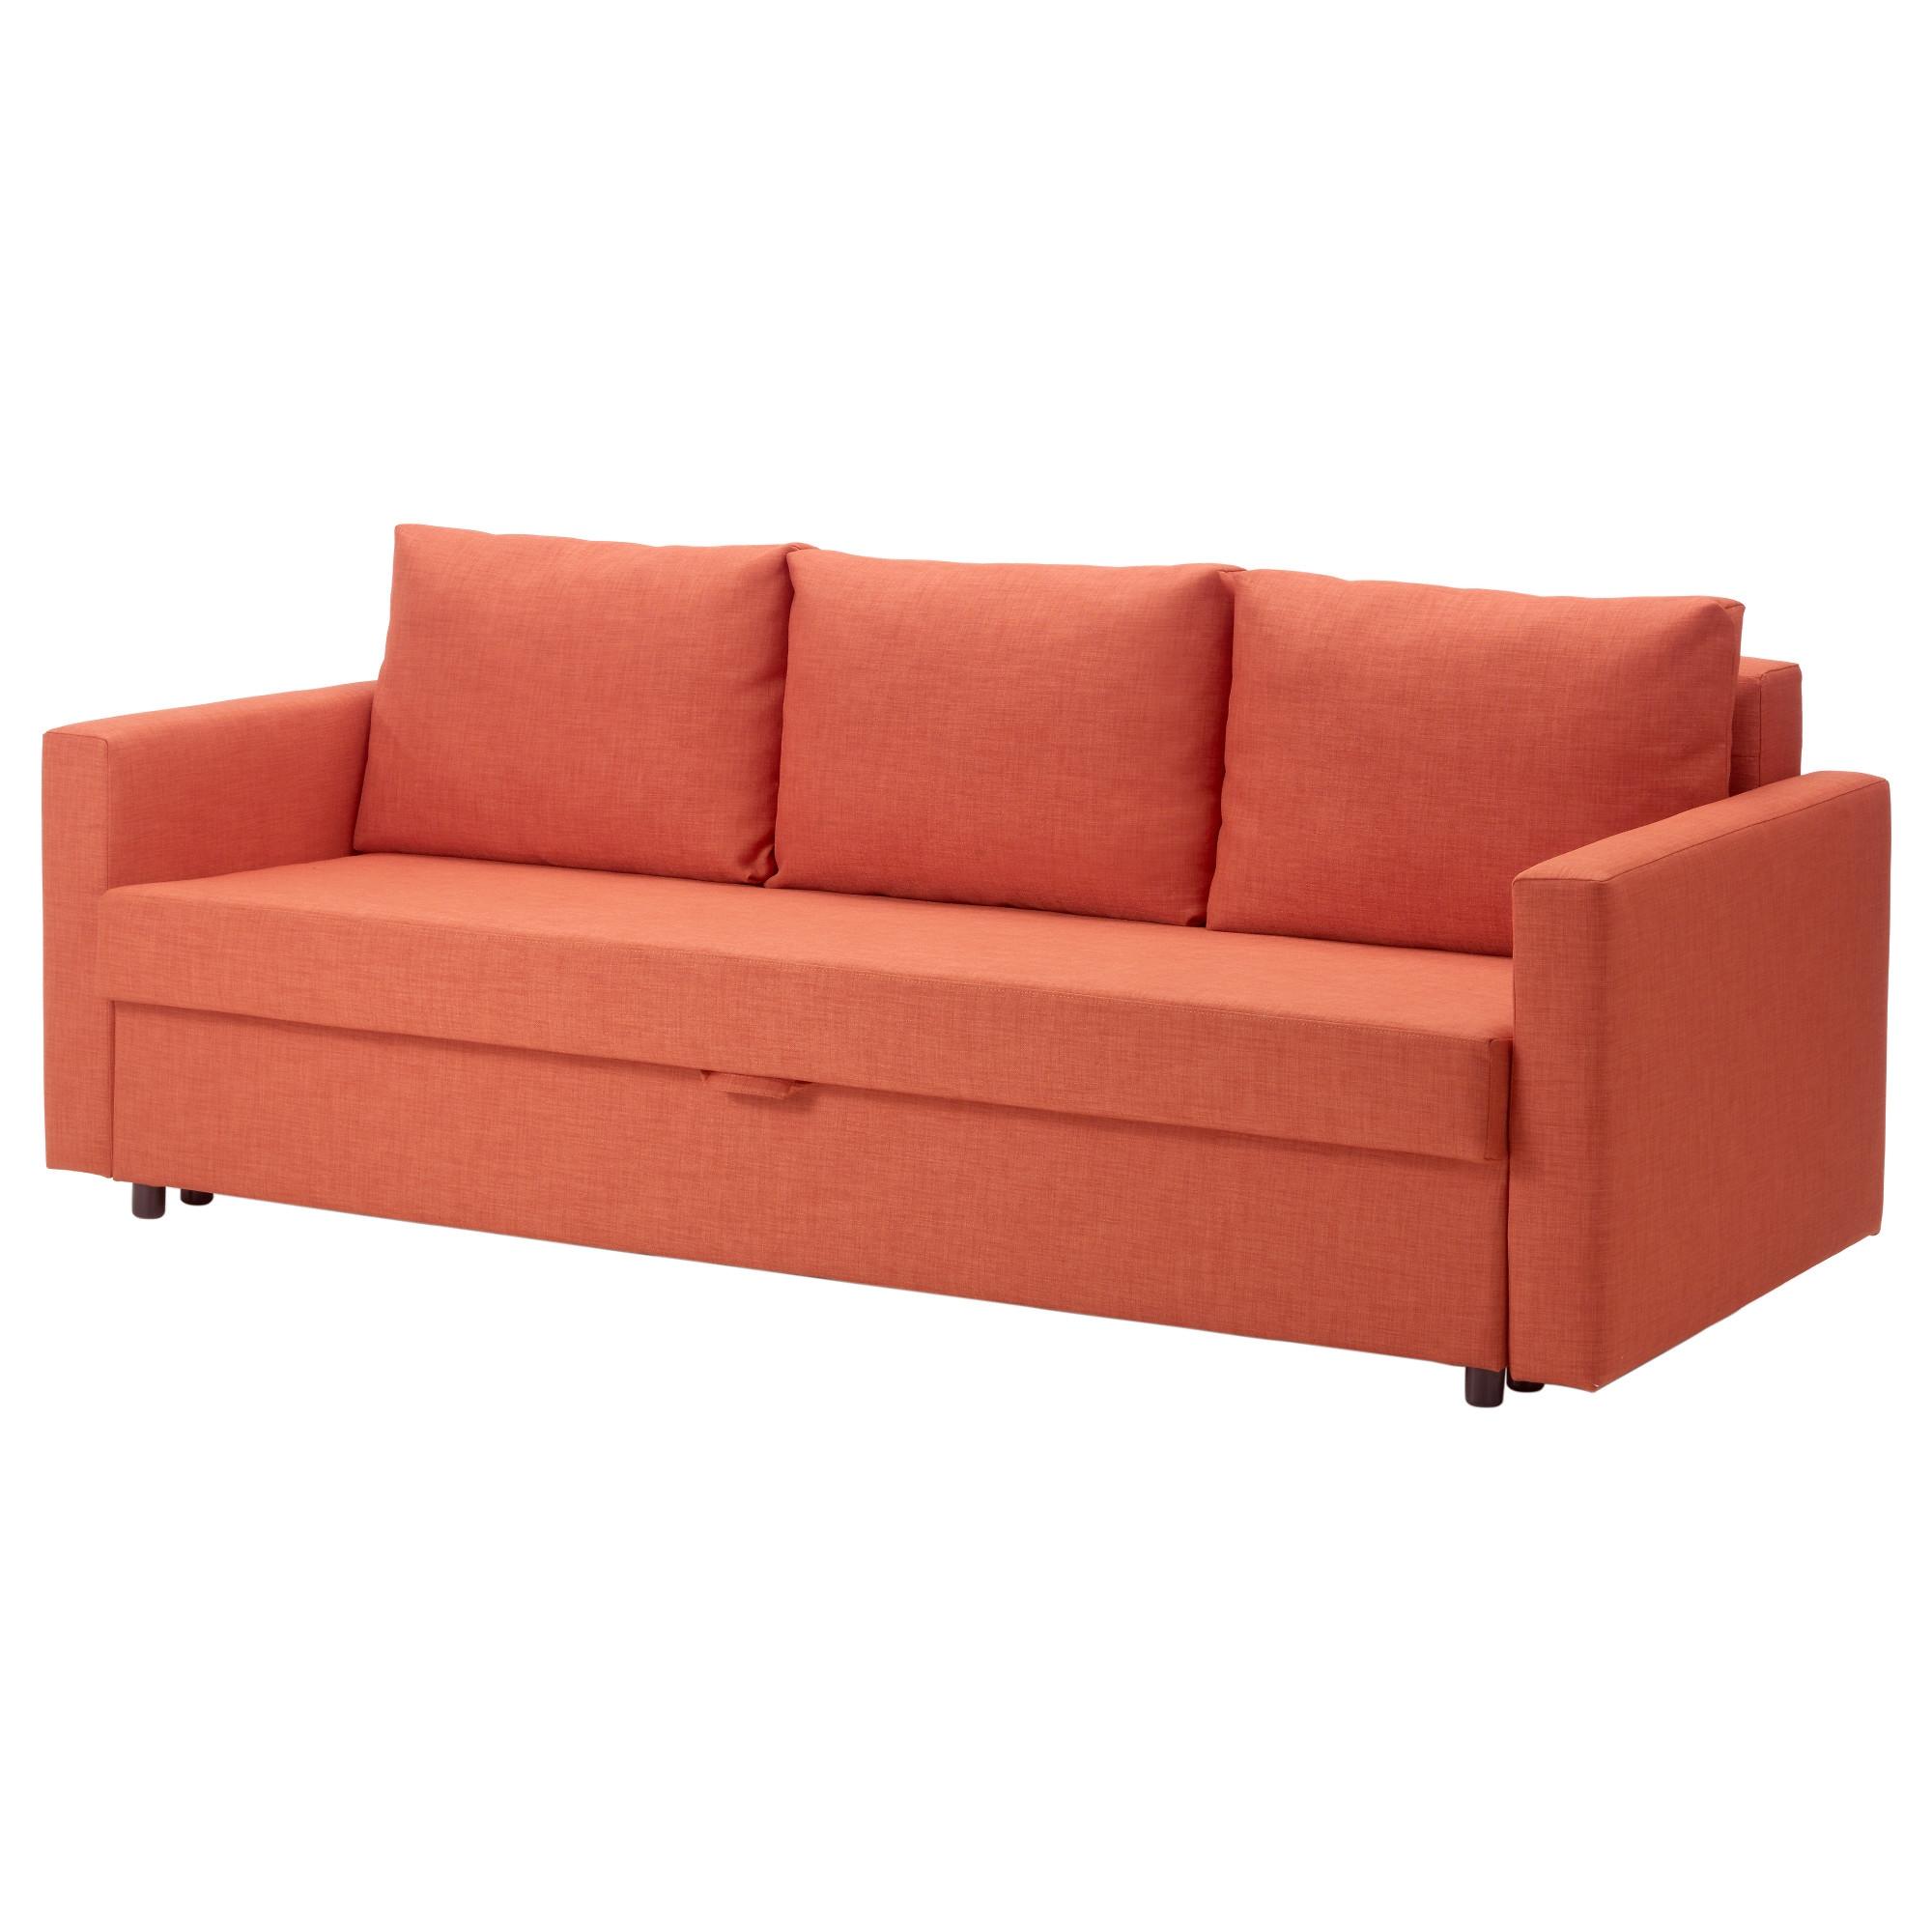 Friheten sof cama 3 plazas skiftebo naranja - Medidas sofa 3 plazas ...